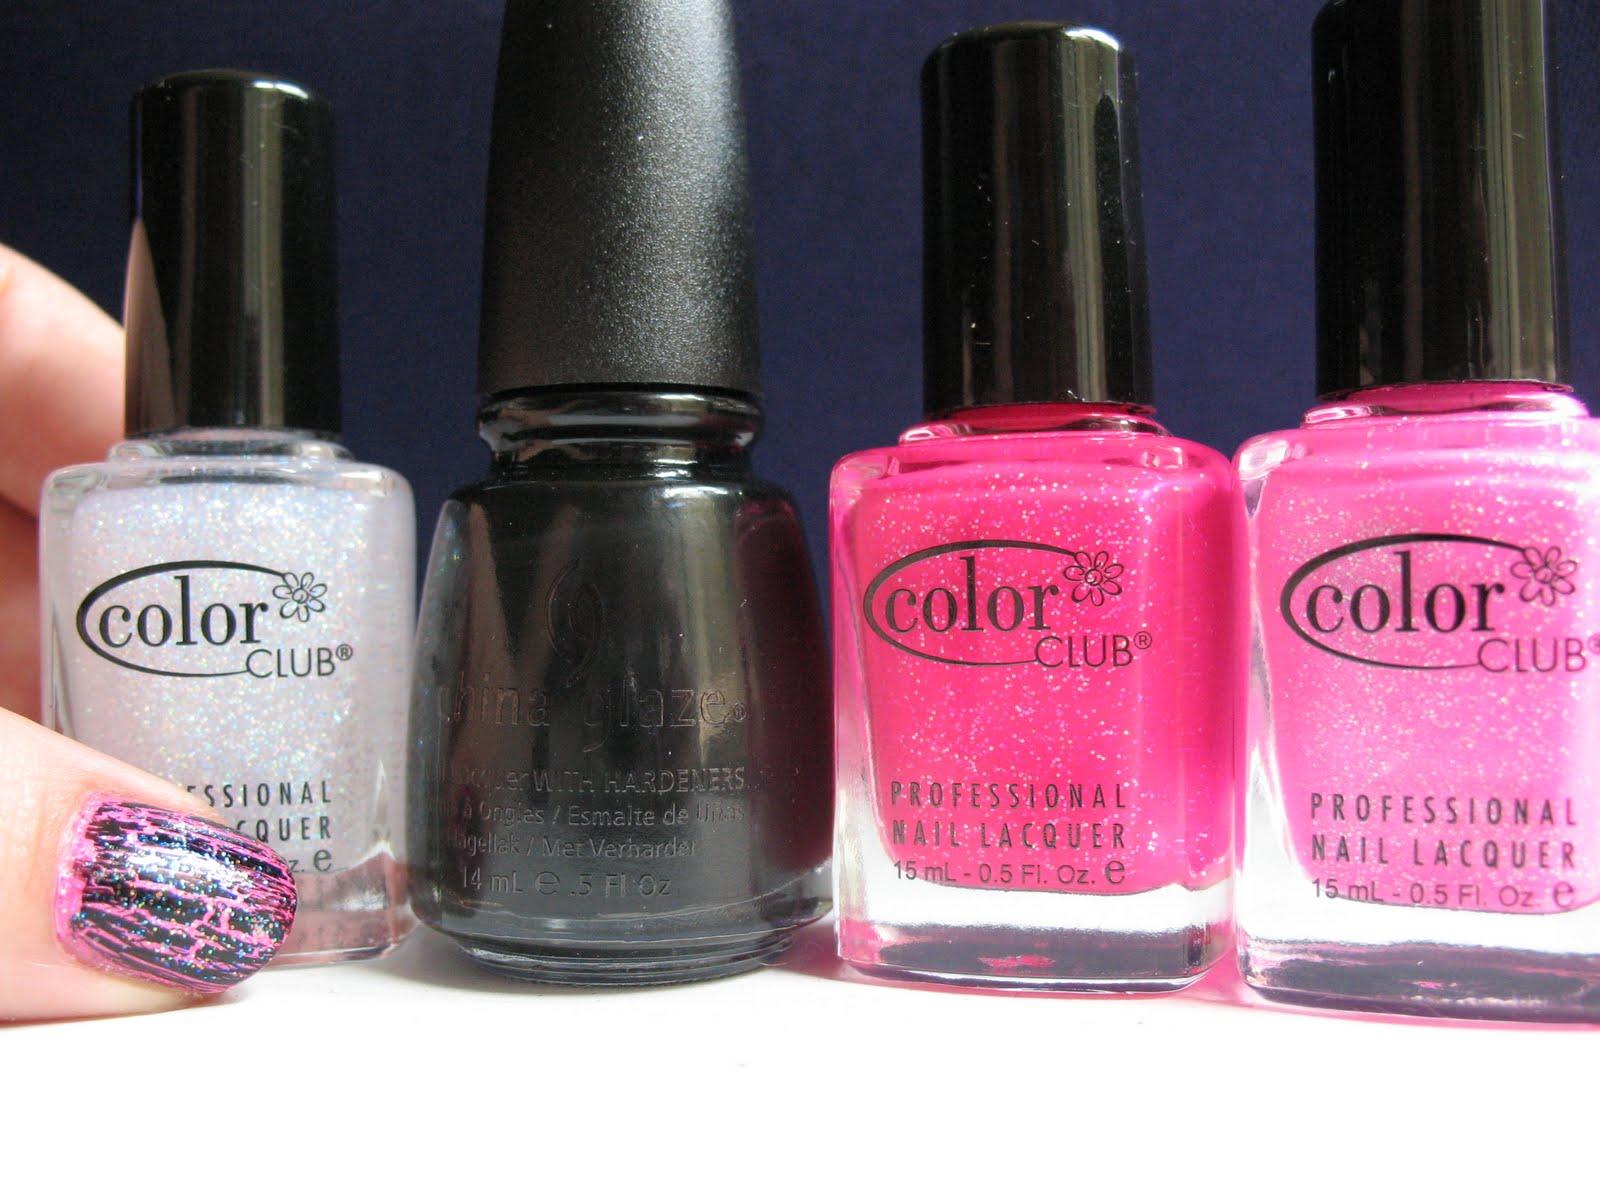 http://4.bp.blogspot.com/--mle-t_sSrE/TeZRRD9j8_I/AAAAAAAAFCU/ps6ct9y7_-g/s1600/color_club_black_mesh_bottles.JPG